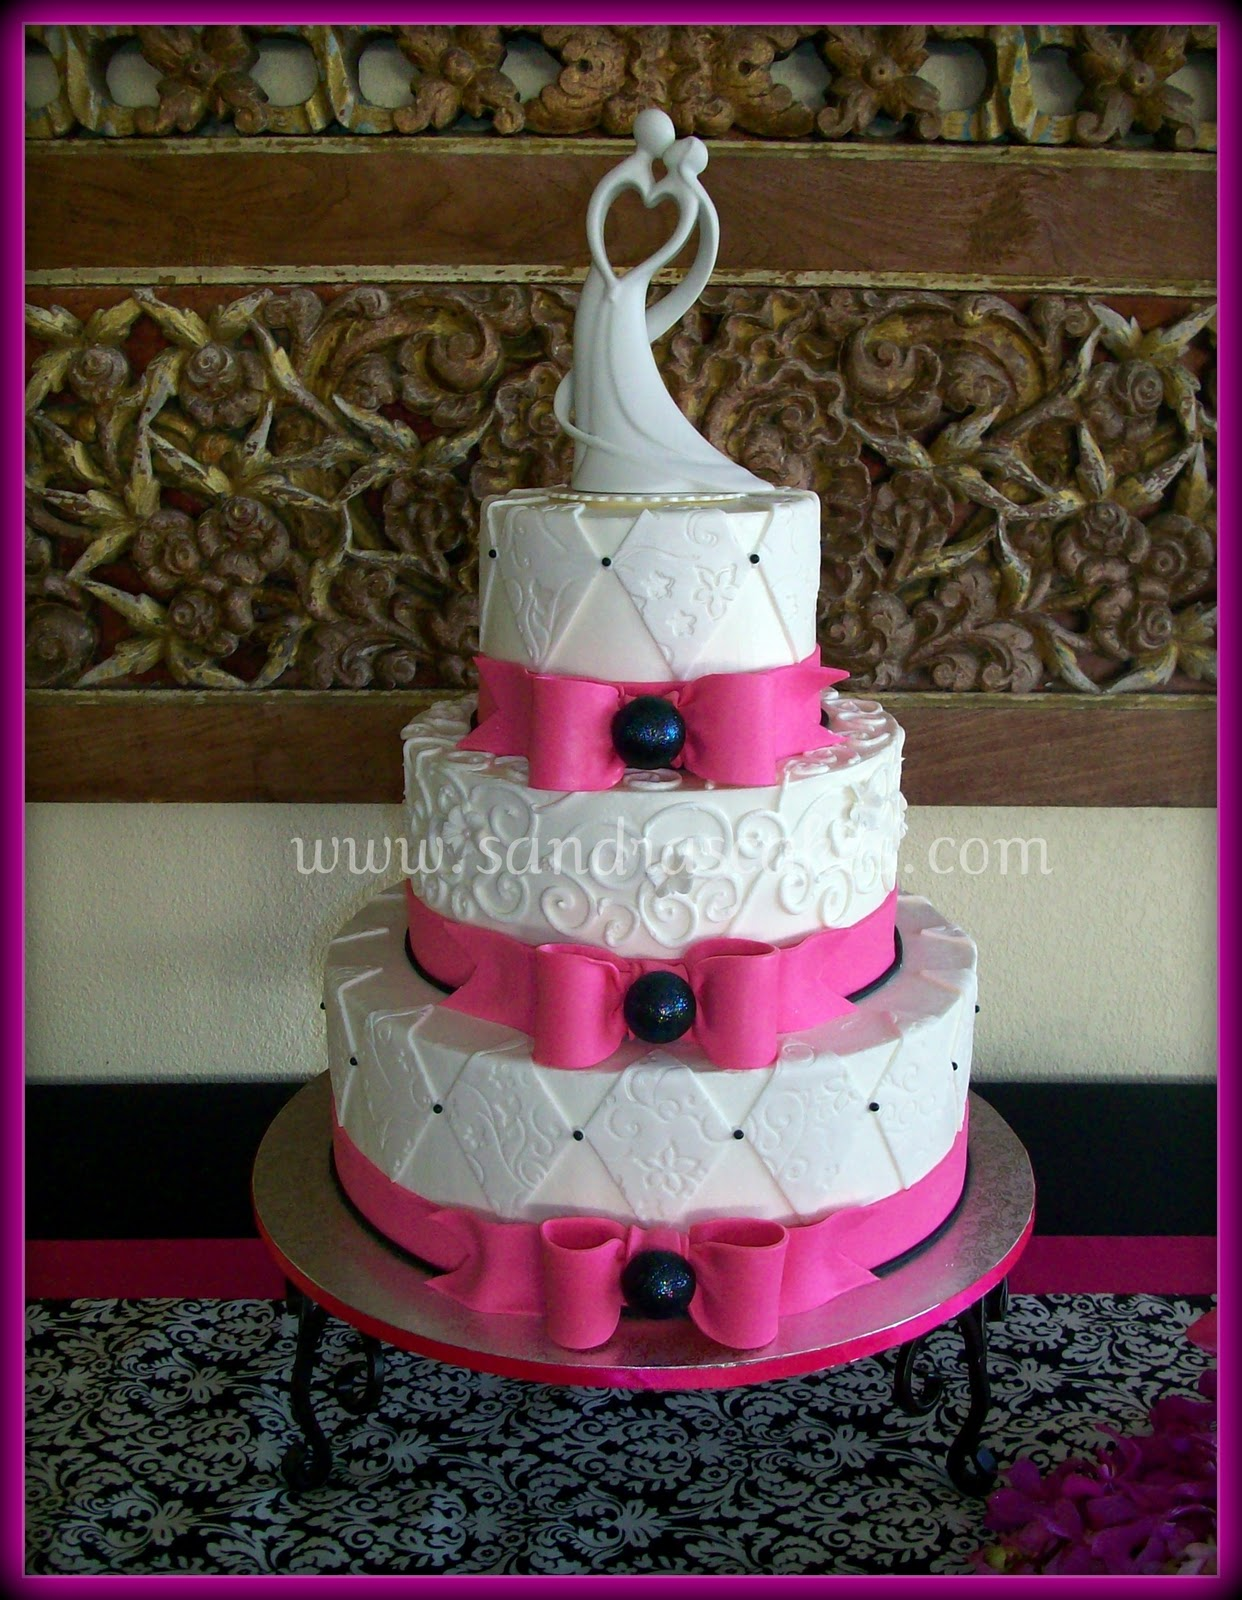 Terrilyn\'s blog: Hot Pink & Black Wedding Cake